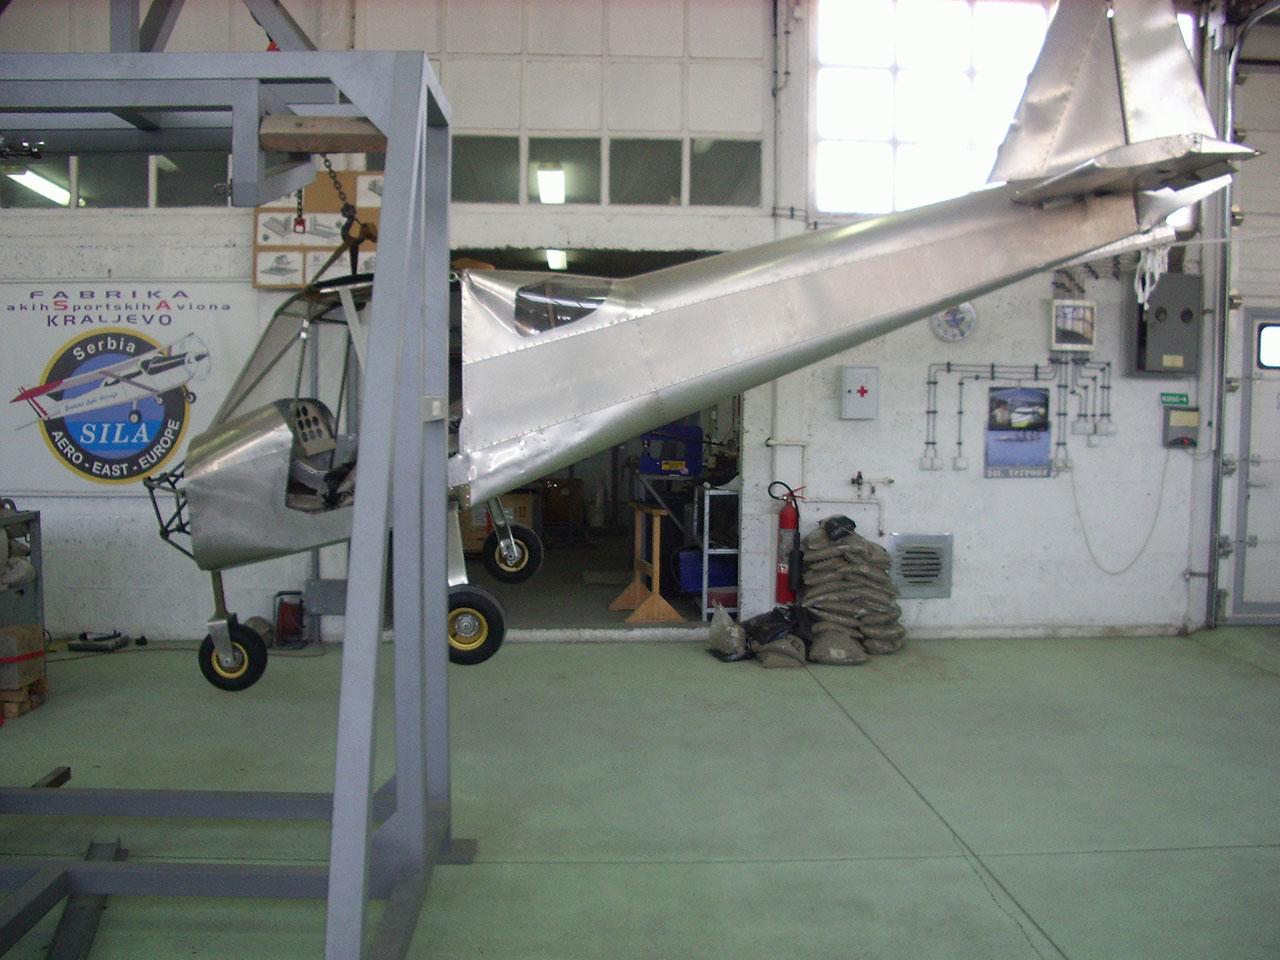 Aero east europe spanish certification now sila 450c is spanish certification xflitez Images